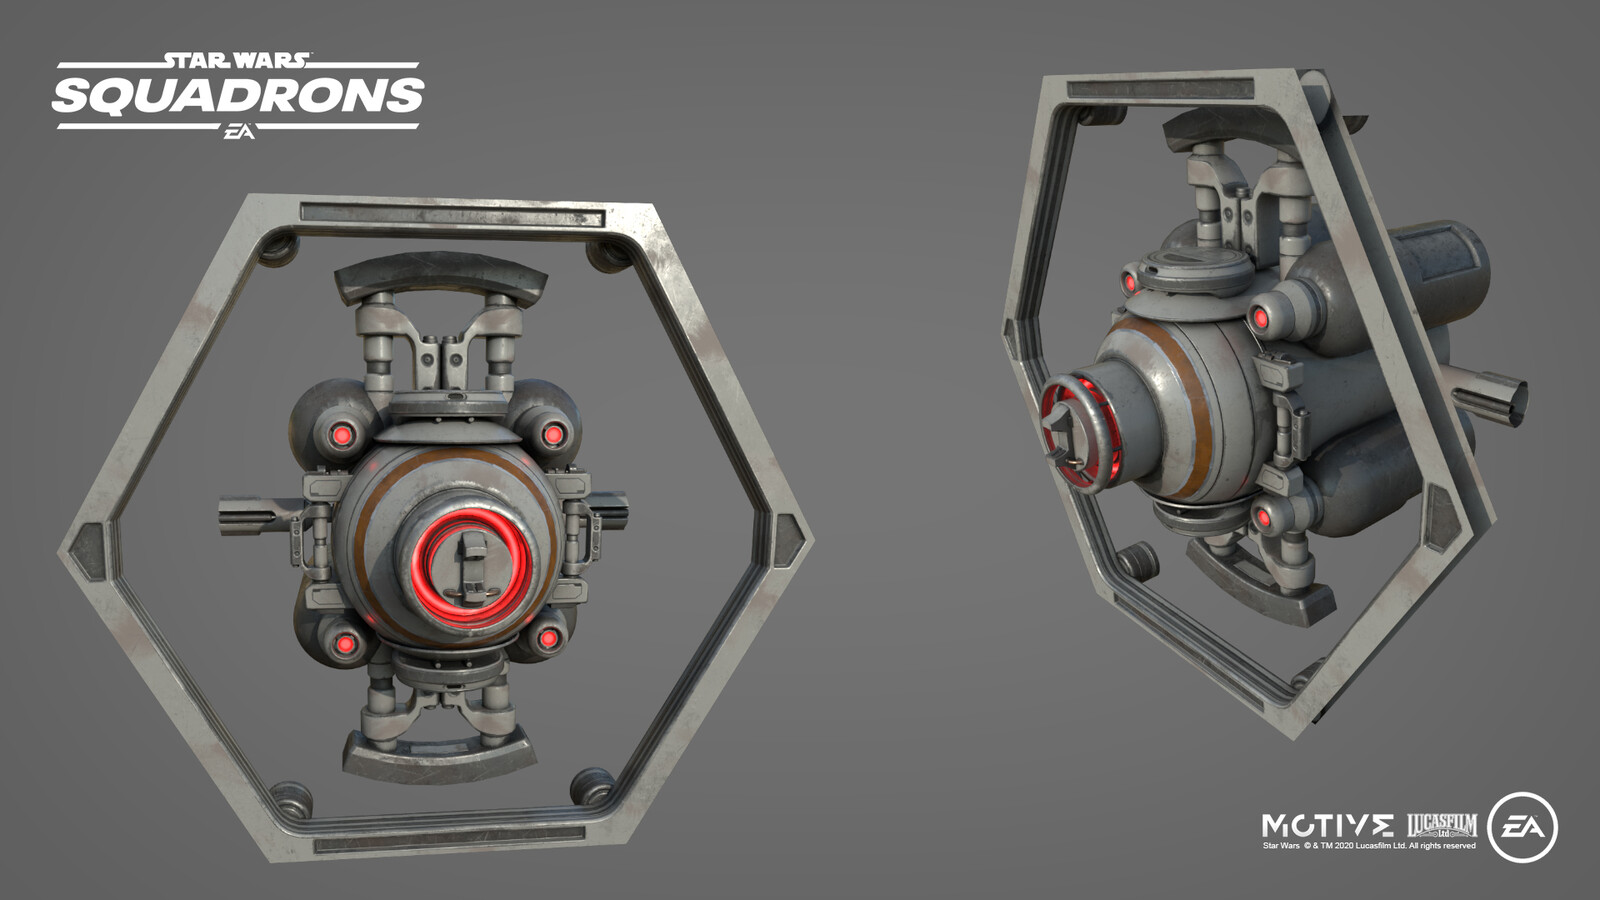 Destructible core reactor inside the Starhawk